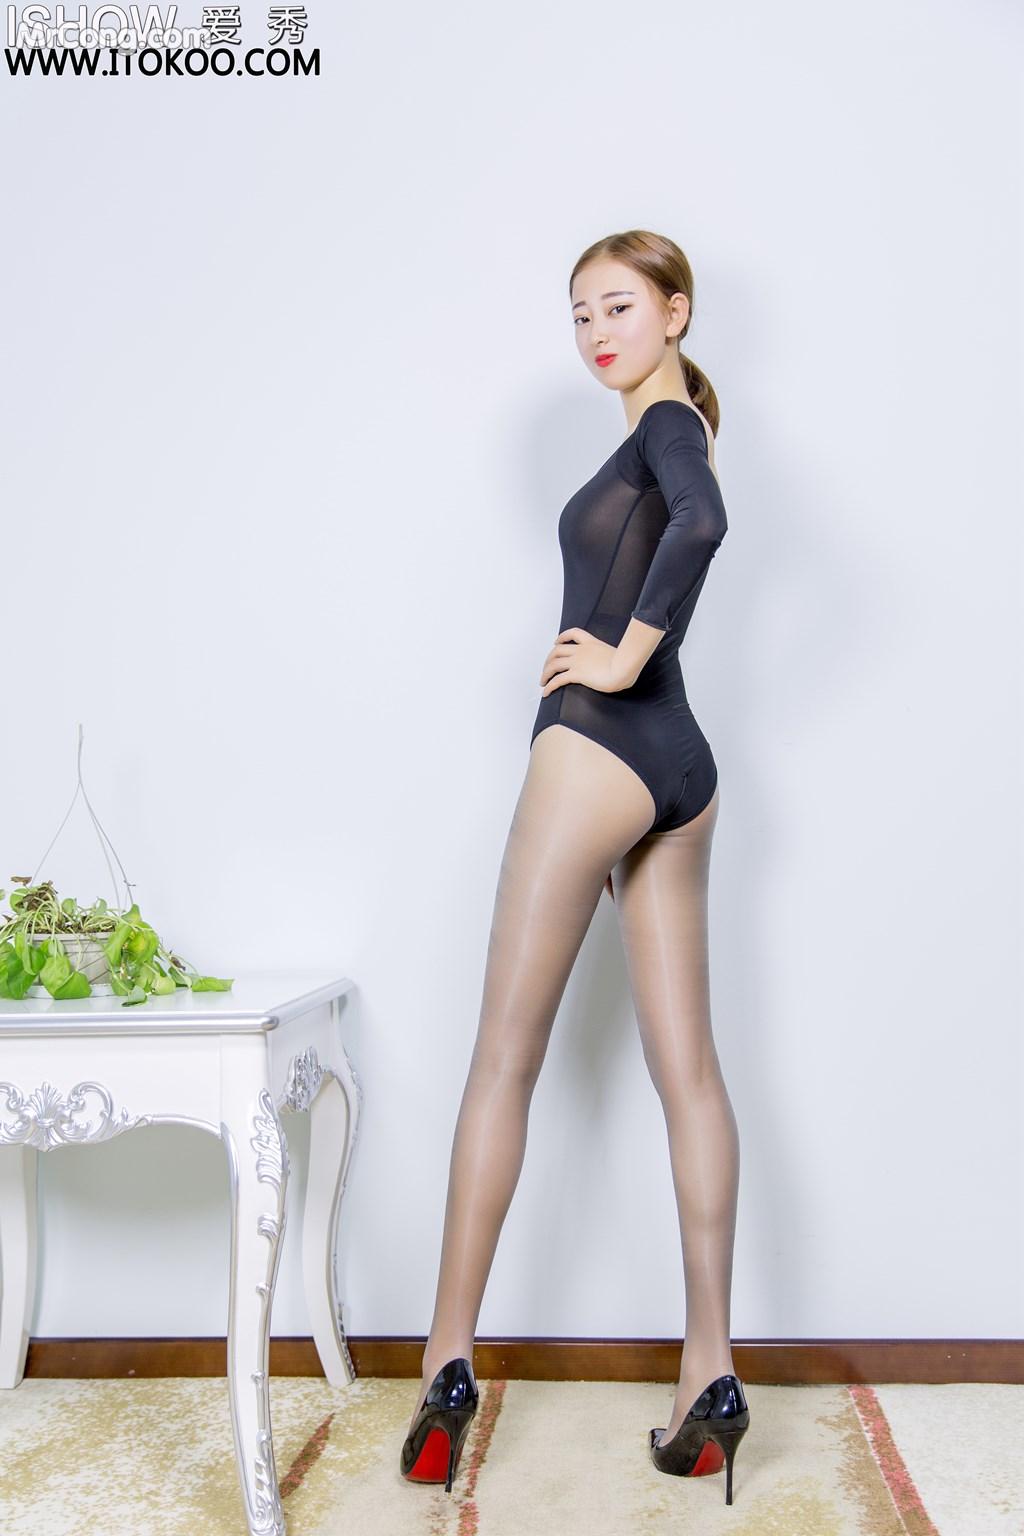 Image ISHOW-No.151-Han-Zhi-Ying-Flora-MrCong.com-004 in post ISHOW No.151: Người mẫu Han Zhi Ying (寒栀樱Flora) (31 ảnh)